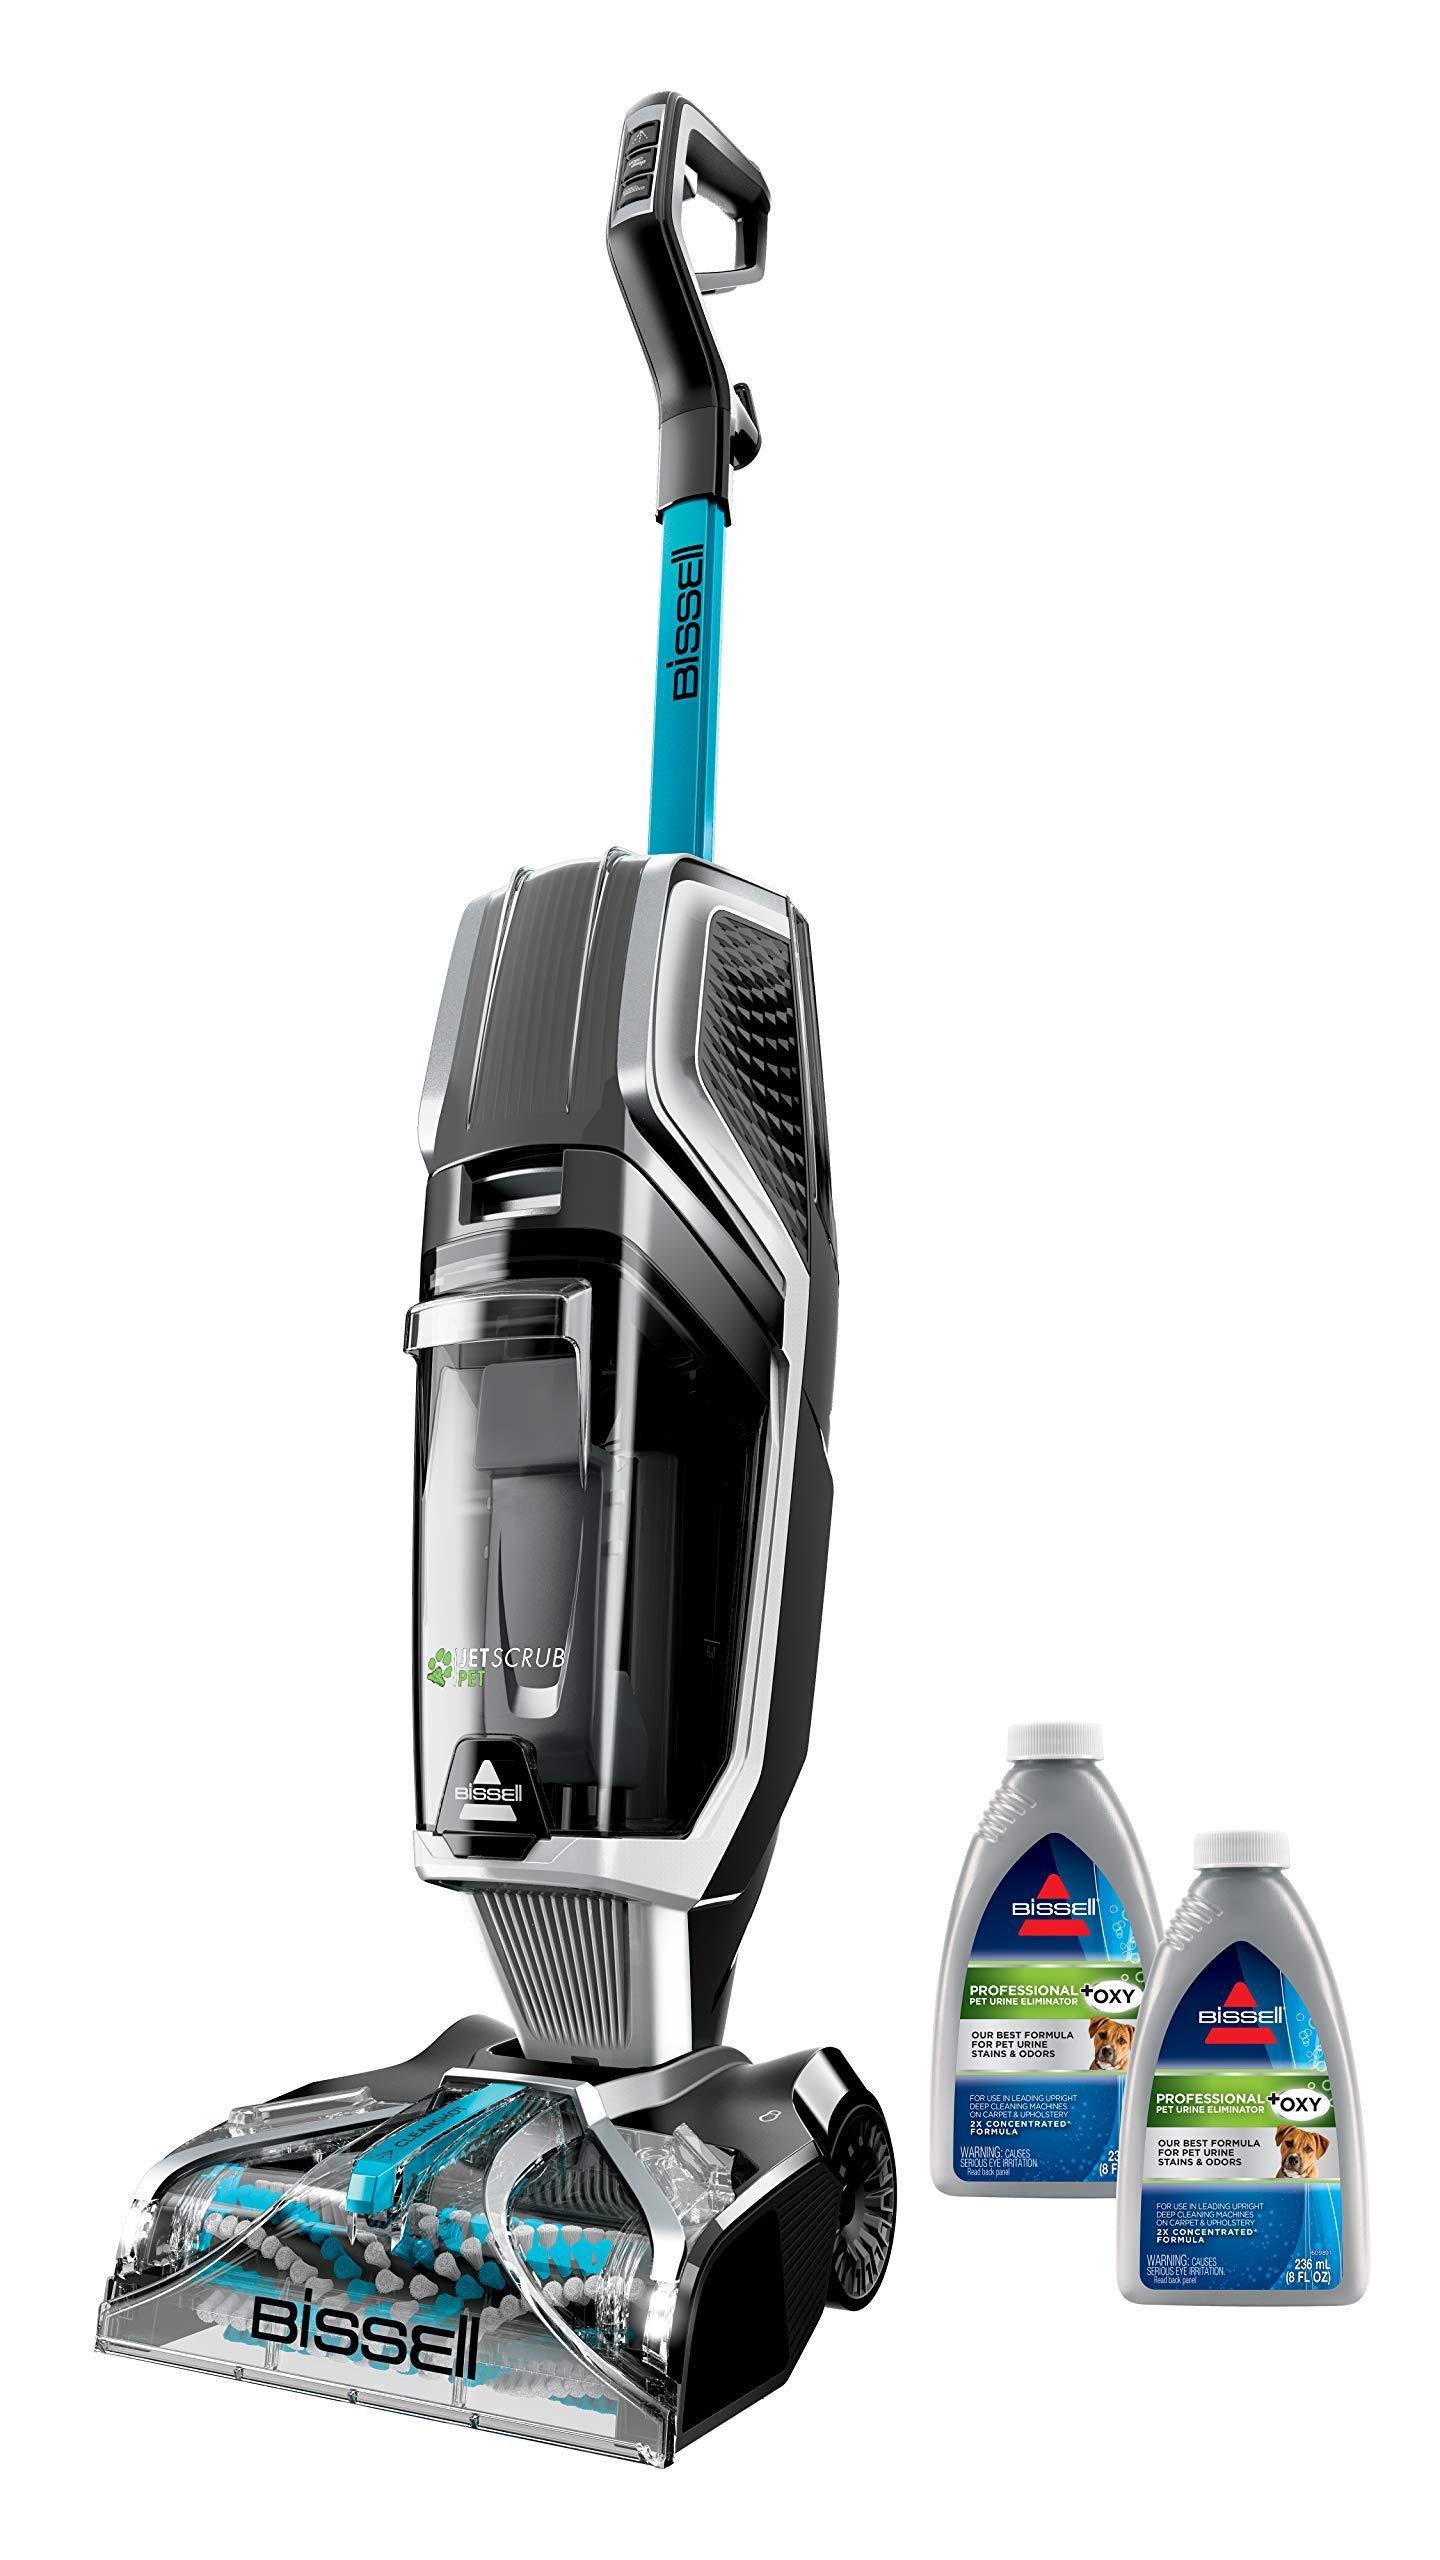 BISSELL JetScrub Upright Cleaner 25299